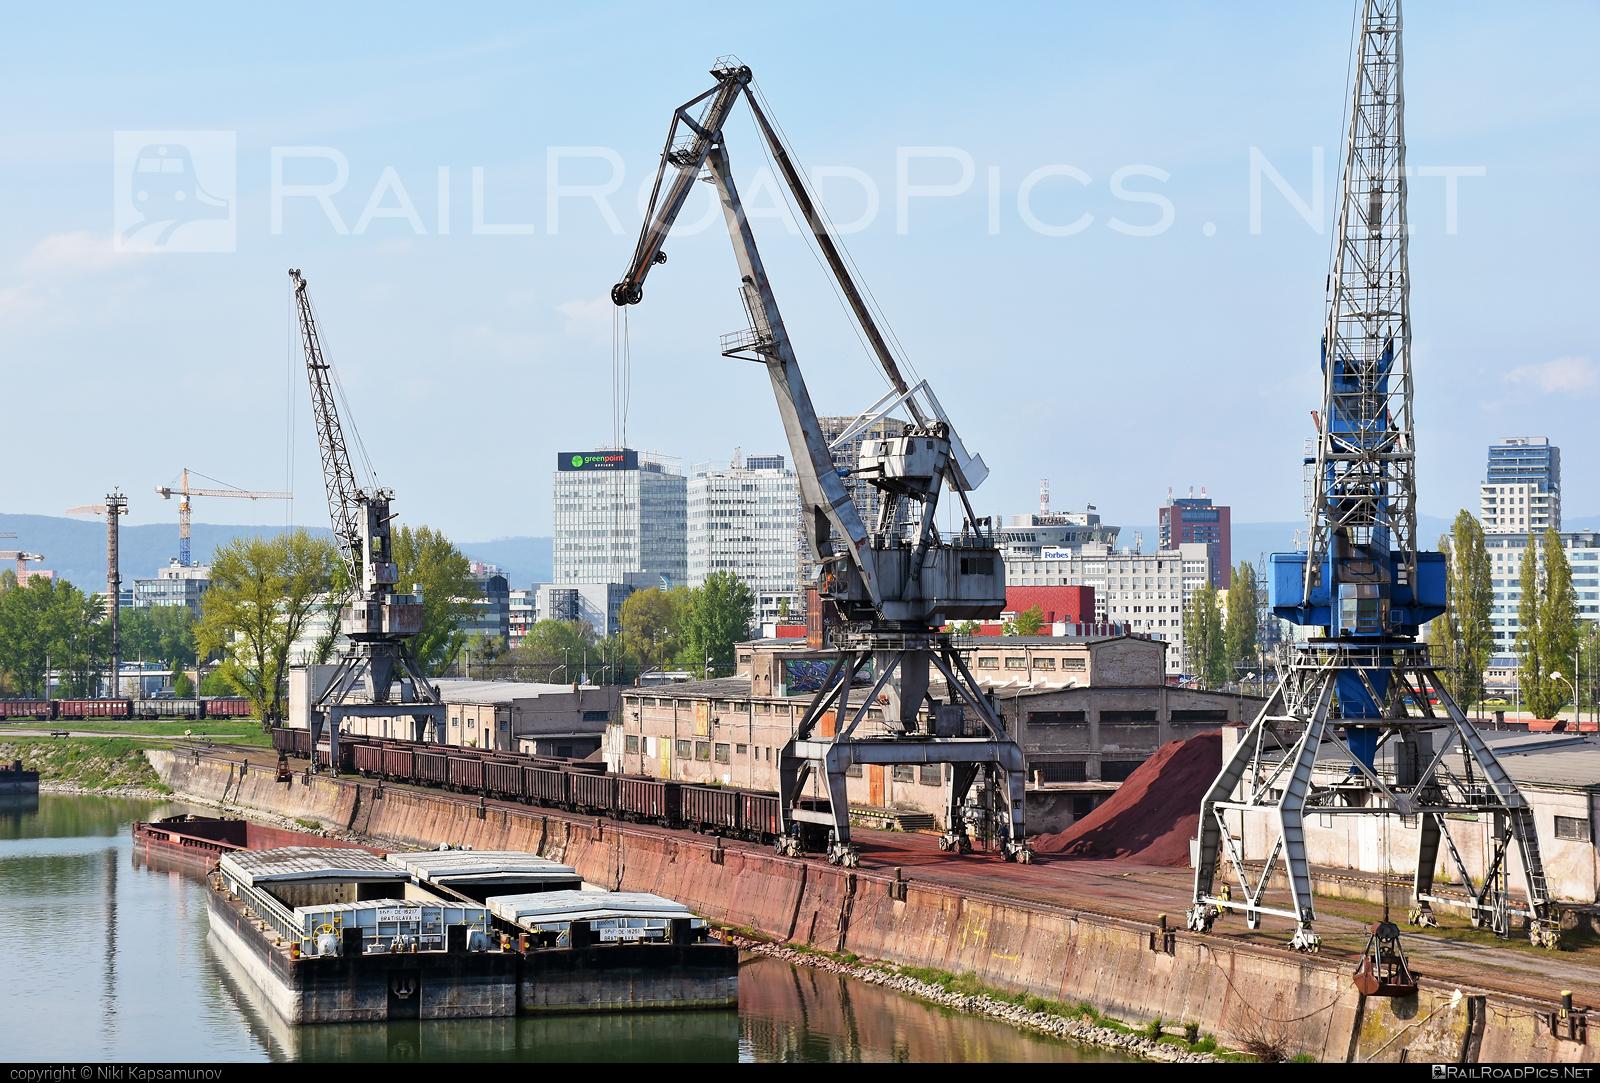 Prístav Bratislava location overview #crane #pristavbratislava